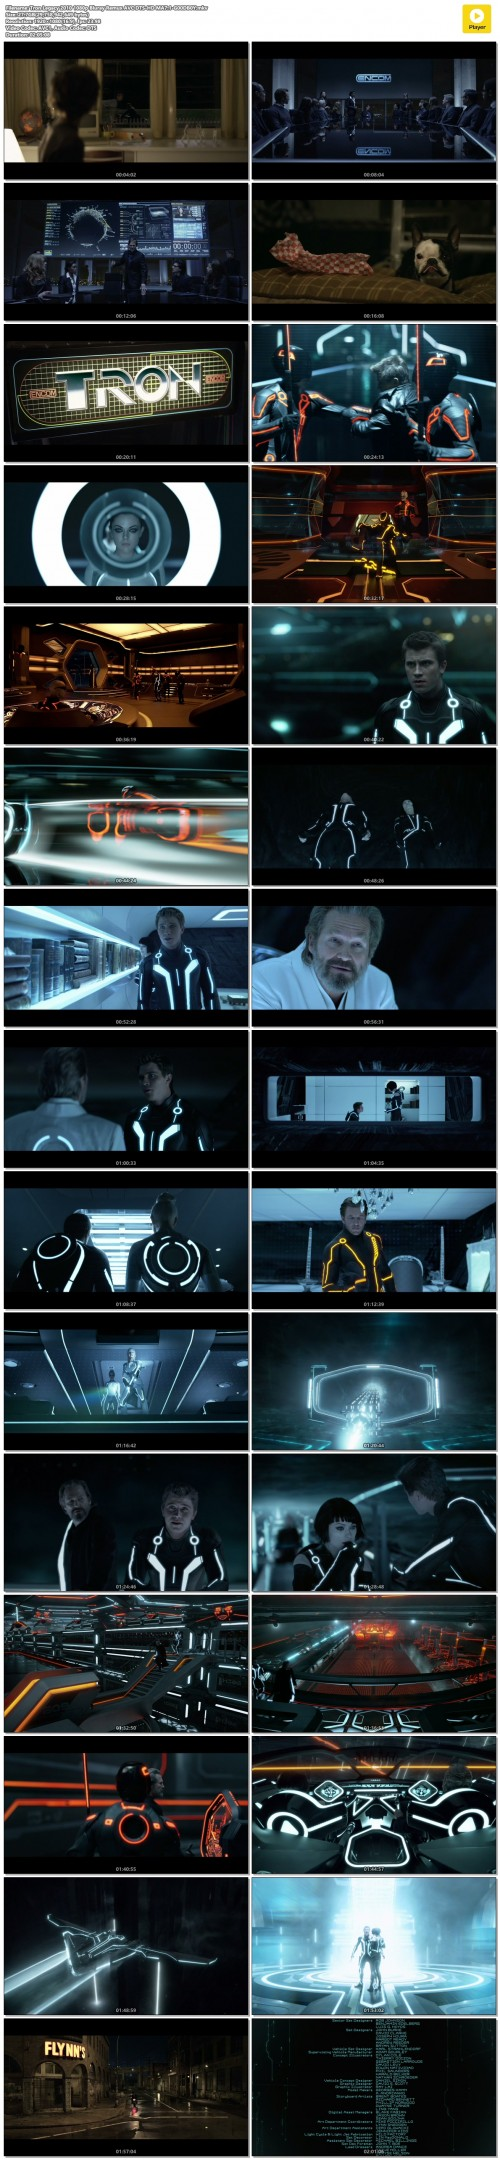 Tron-Legacy-2010-1080p-Bluray-Remux-AVC-DTS-HD-MA7.1-G00DB0Y.mkv.jpg